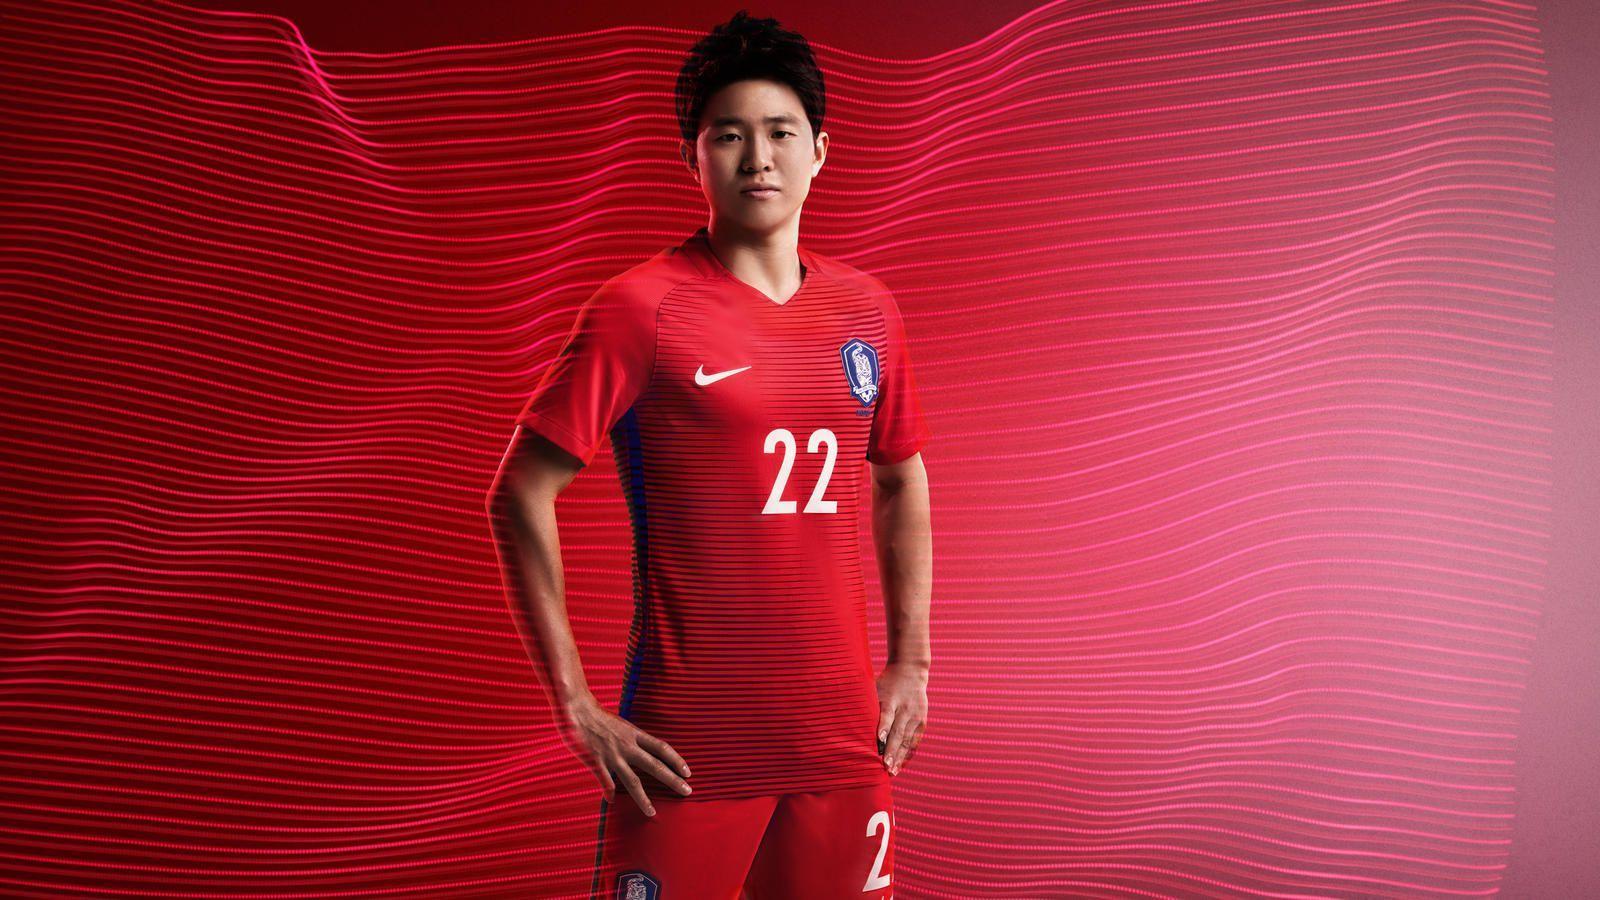 South Korea National Football Background 7